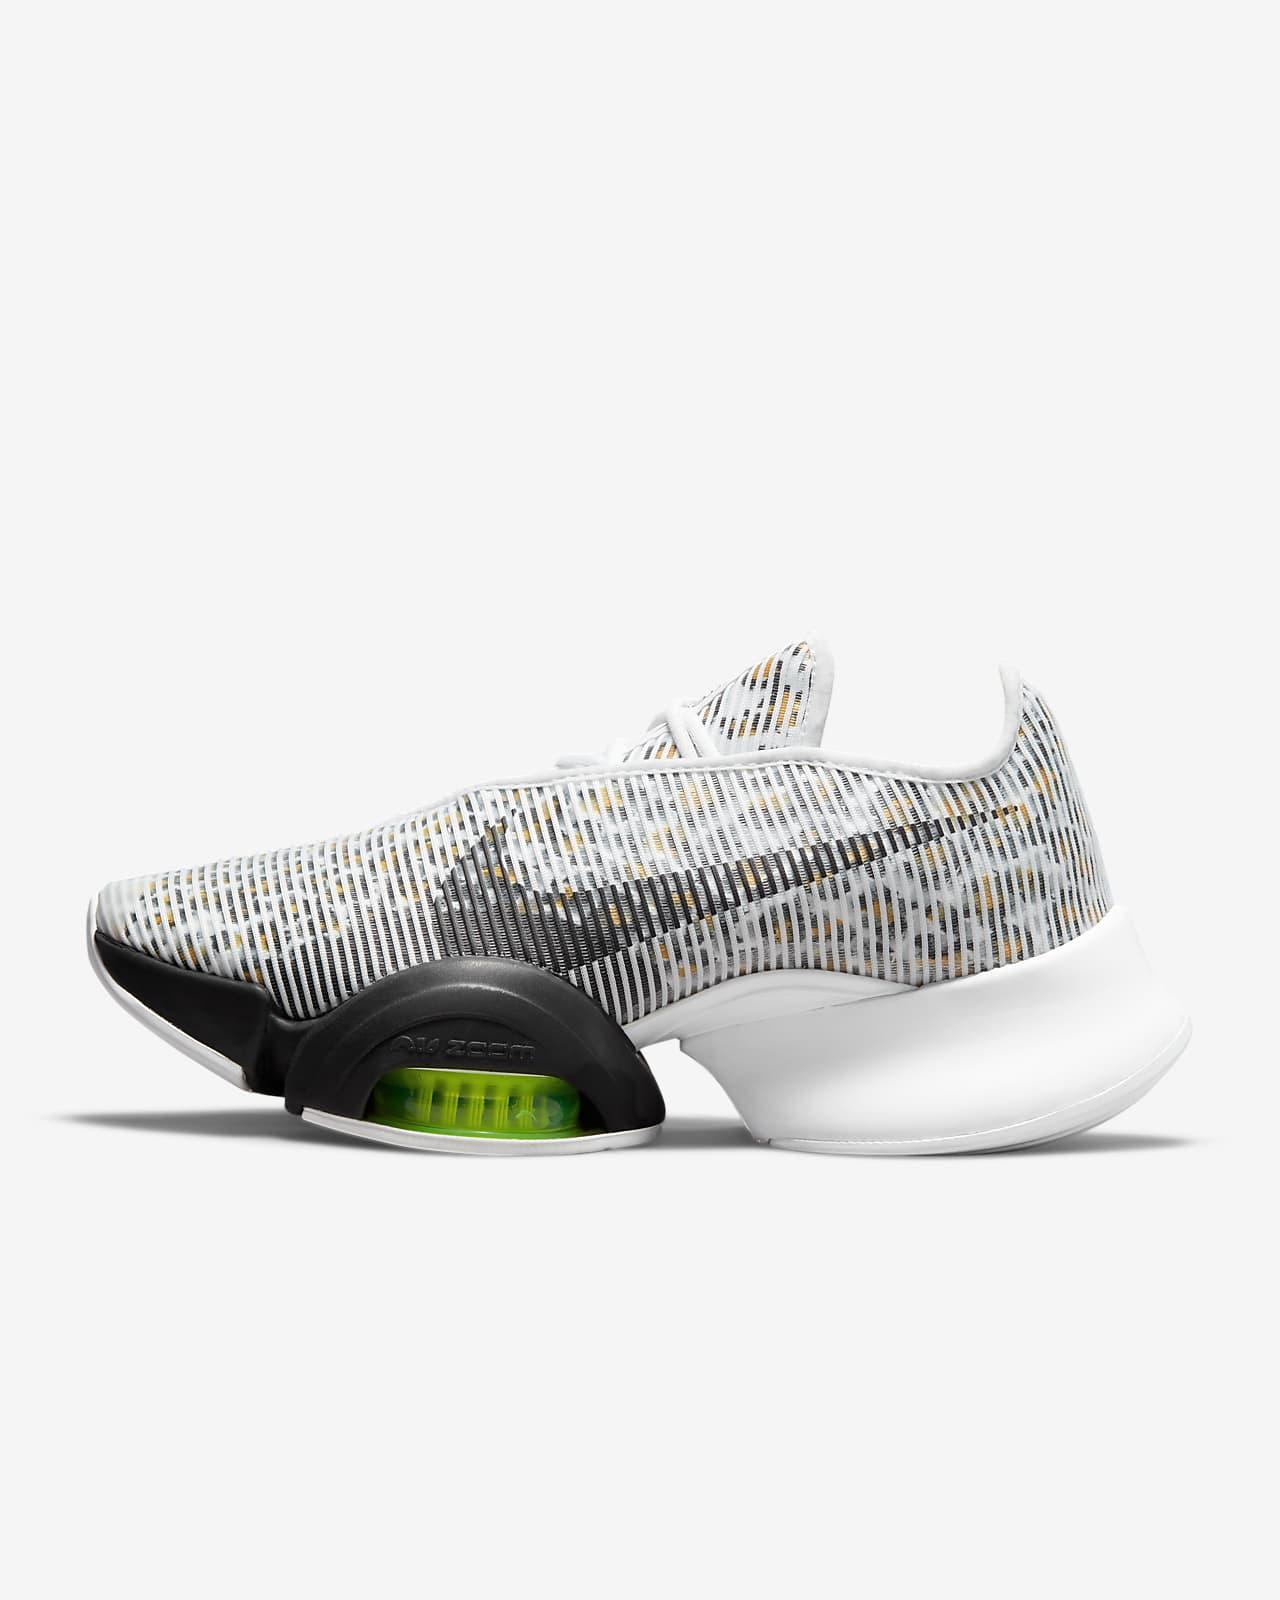 Nike Air Zoom SuperRep 2 Women's HIIT Class Shoes. Nike LU